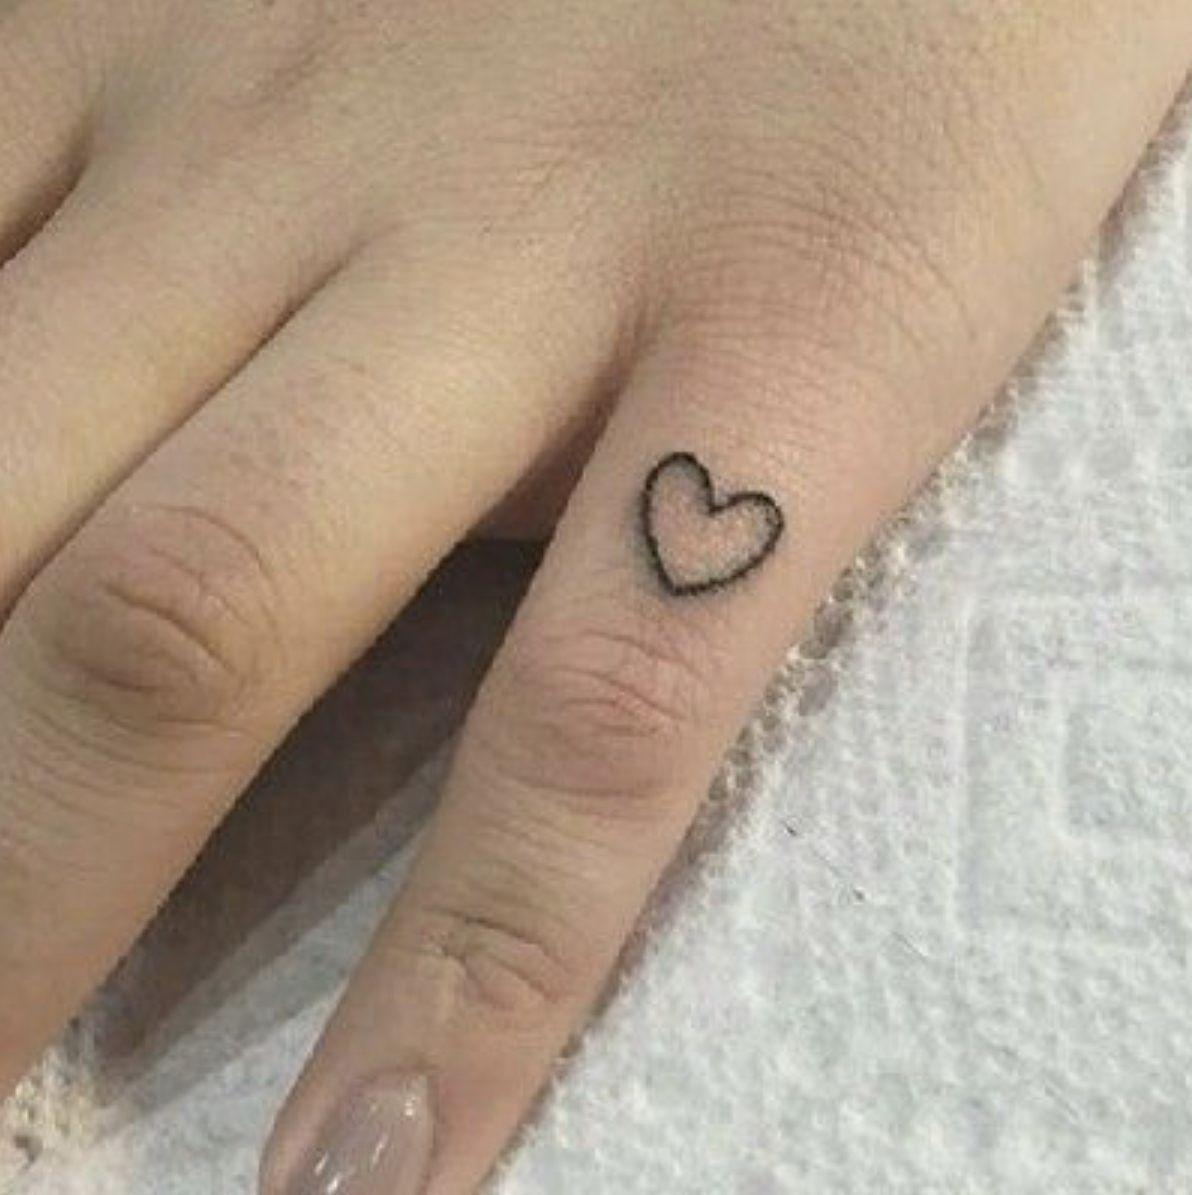 Pinky Finger Heart Tattoo Broken Heart Tattoo Heart Tattoo Hand Tattoos